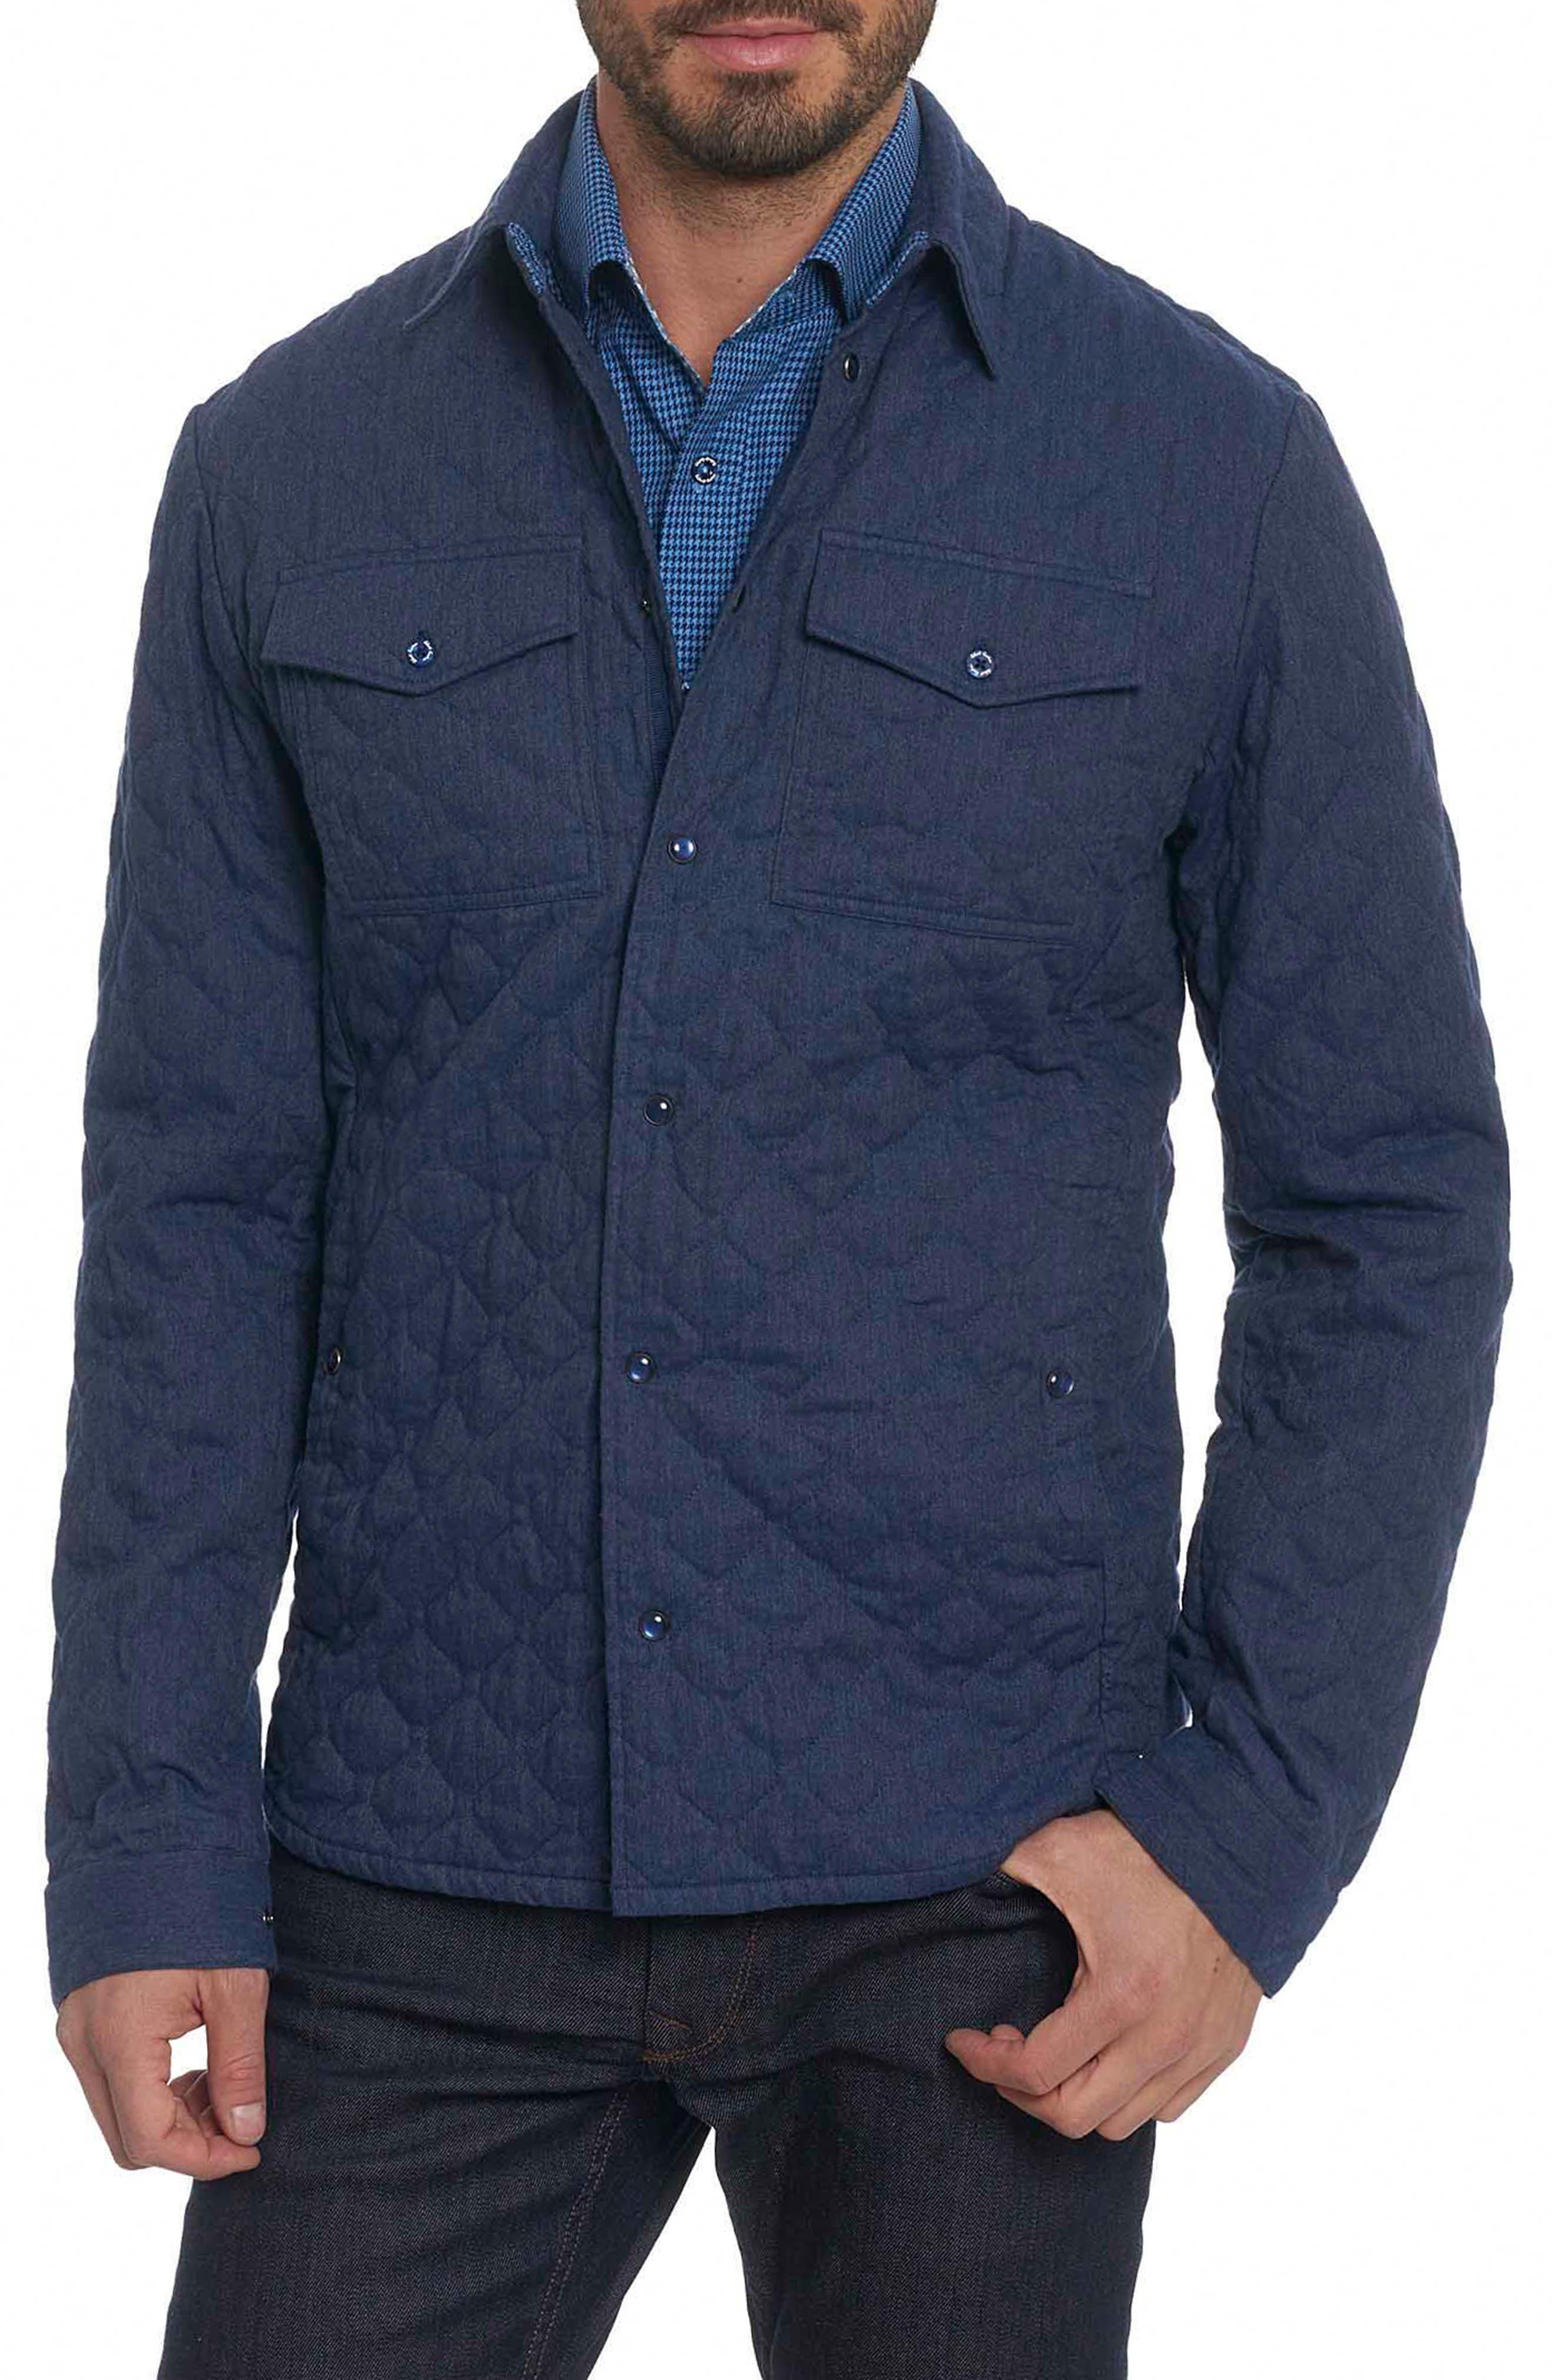 Robert Graham Lance Quilted Shirt Jacket